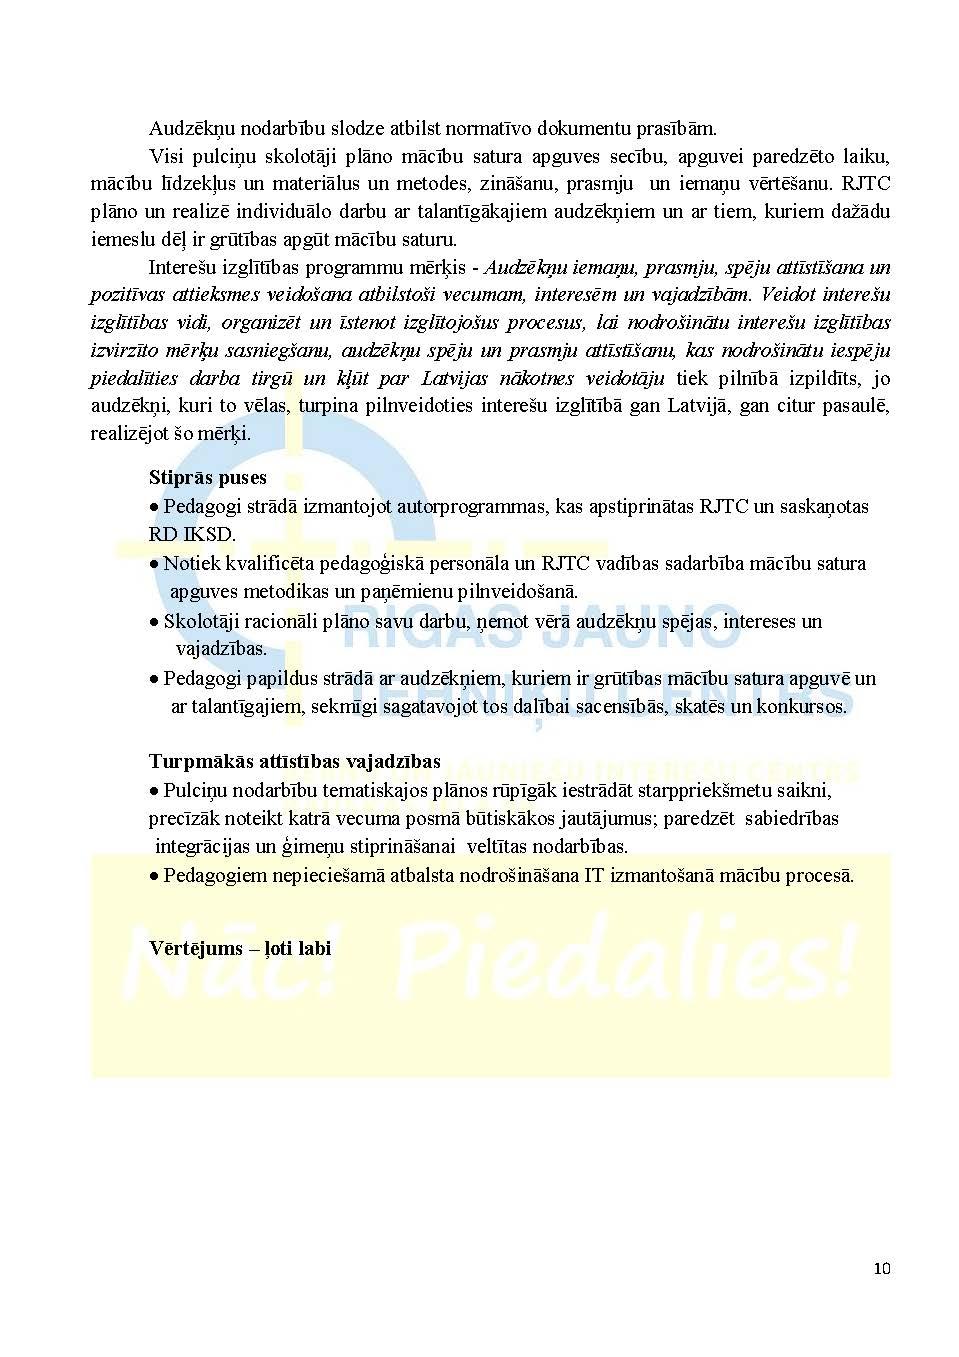 rjtc_2013-10